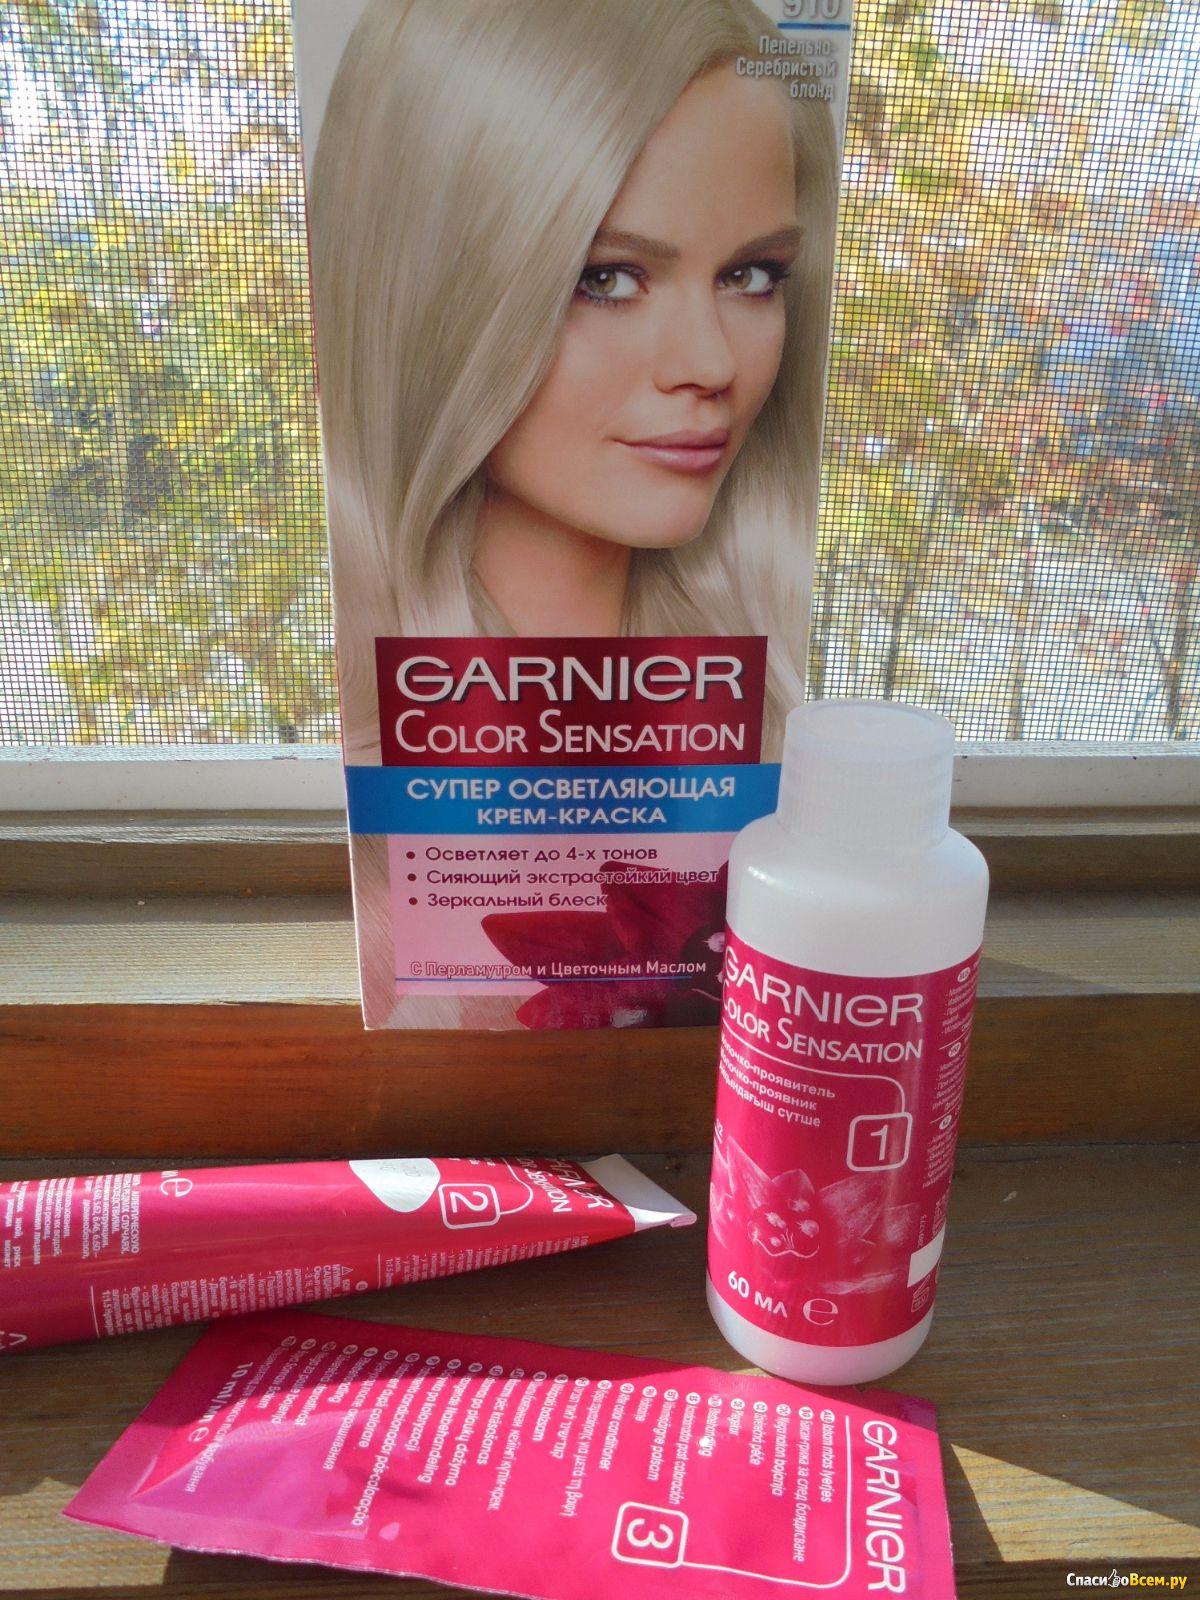 Тест гарнир цвет волос